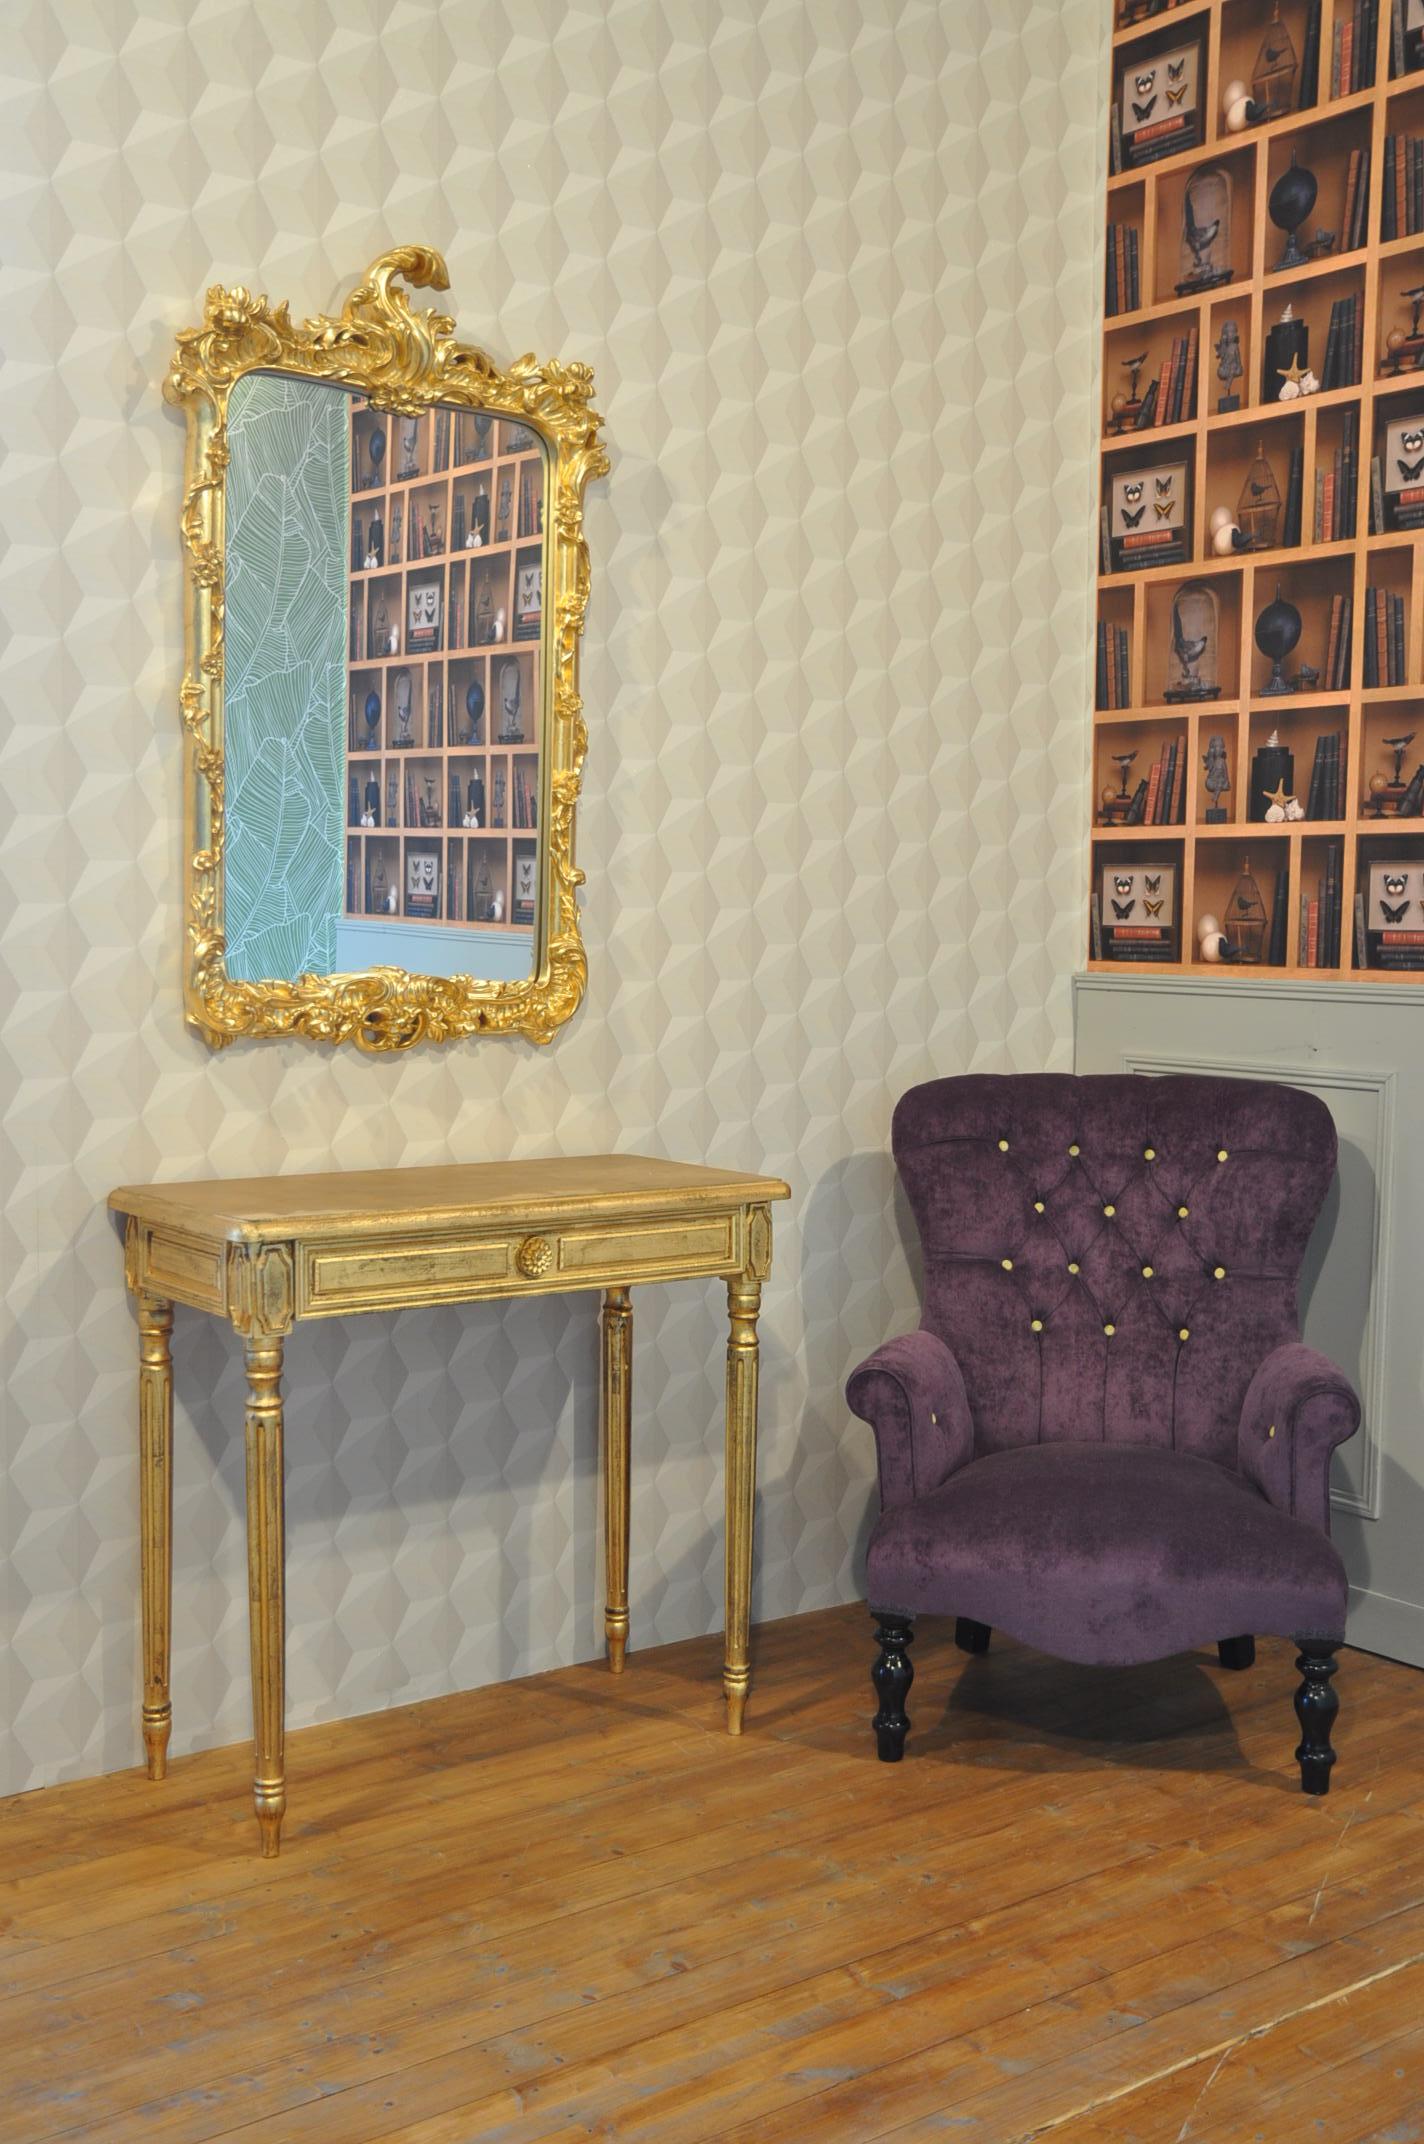 fauteuil velours aubergine 70539 fauteuil id es. Black Bedroom Furniture Sets. Home Design Ideas